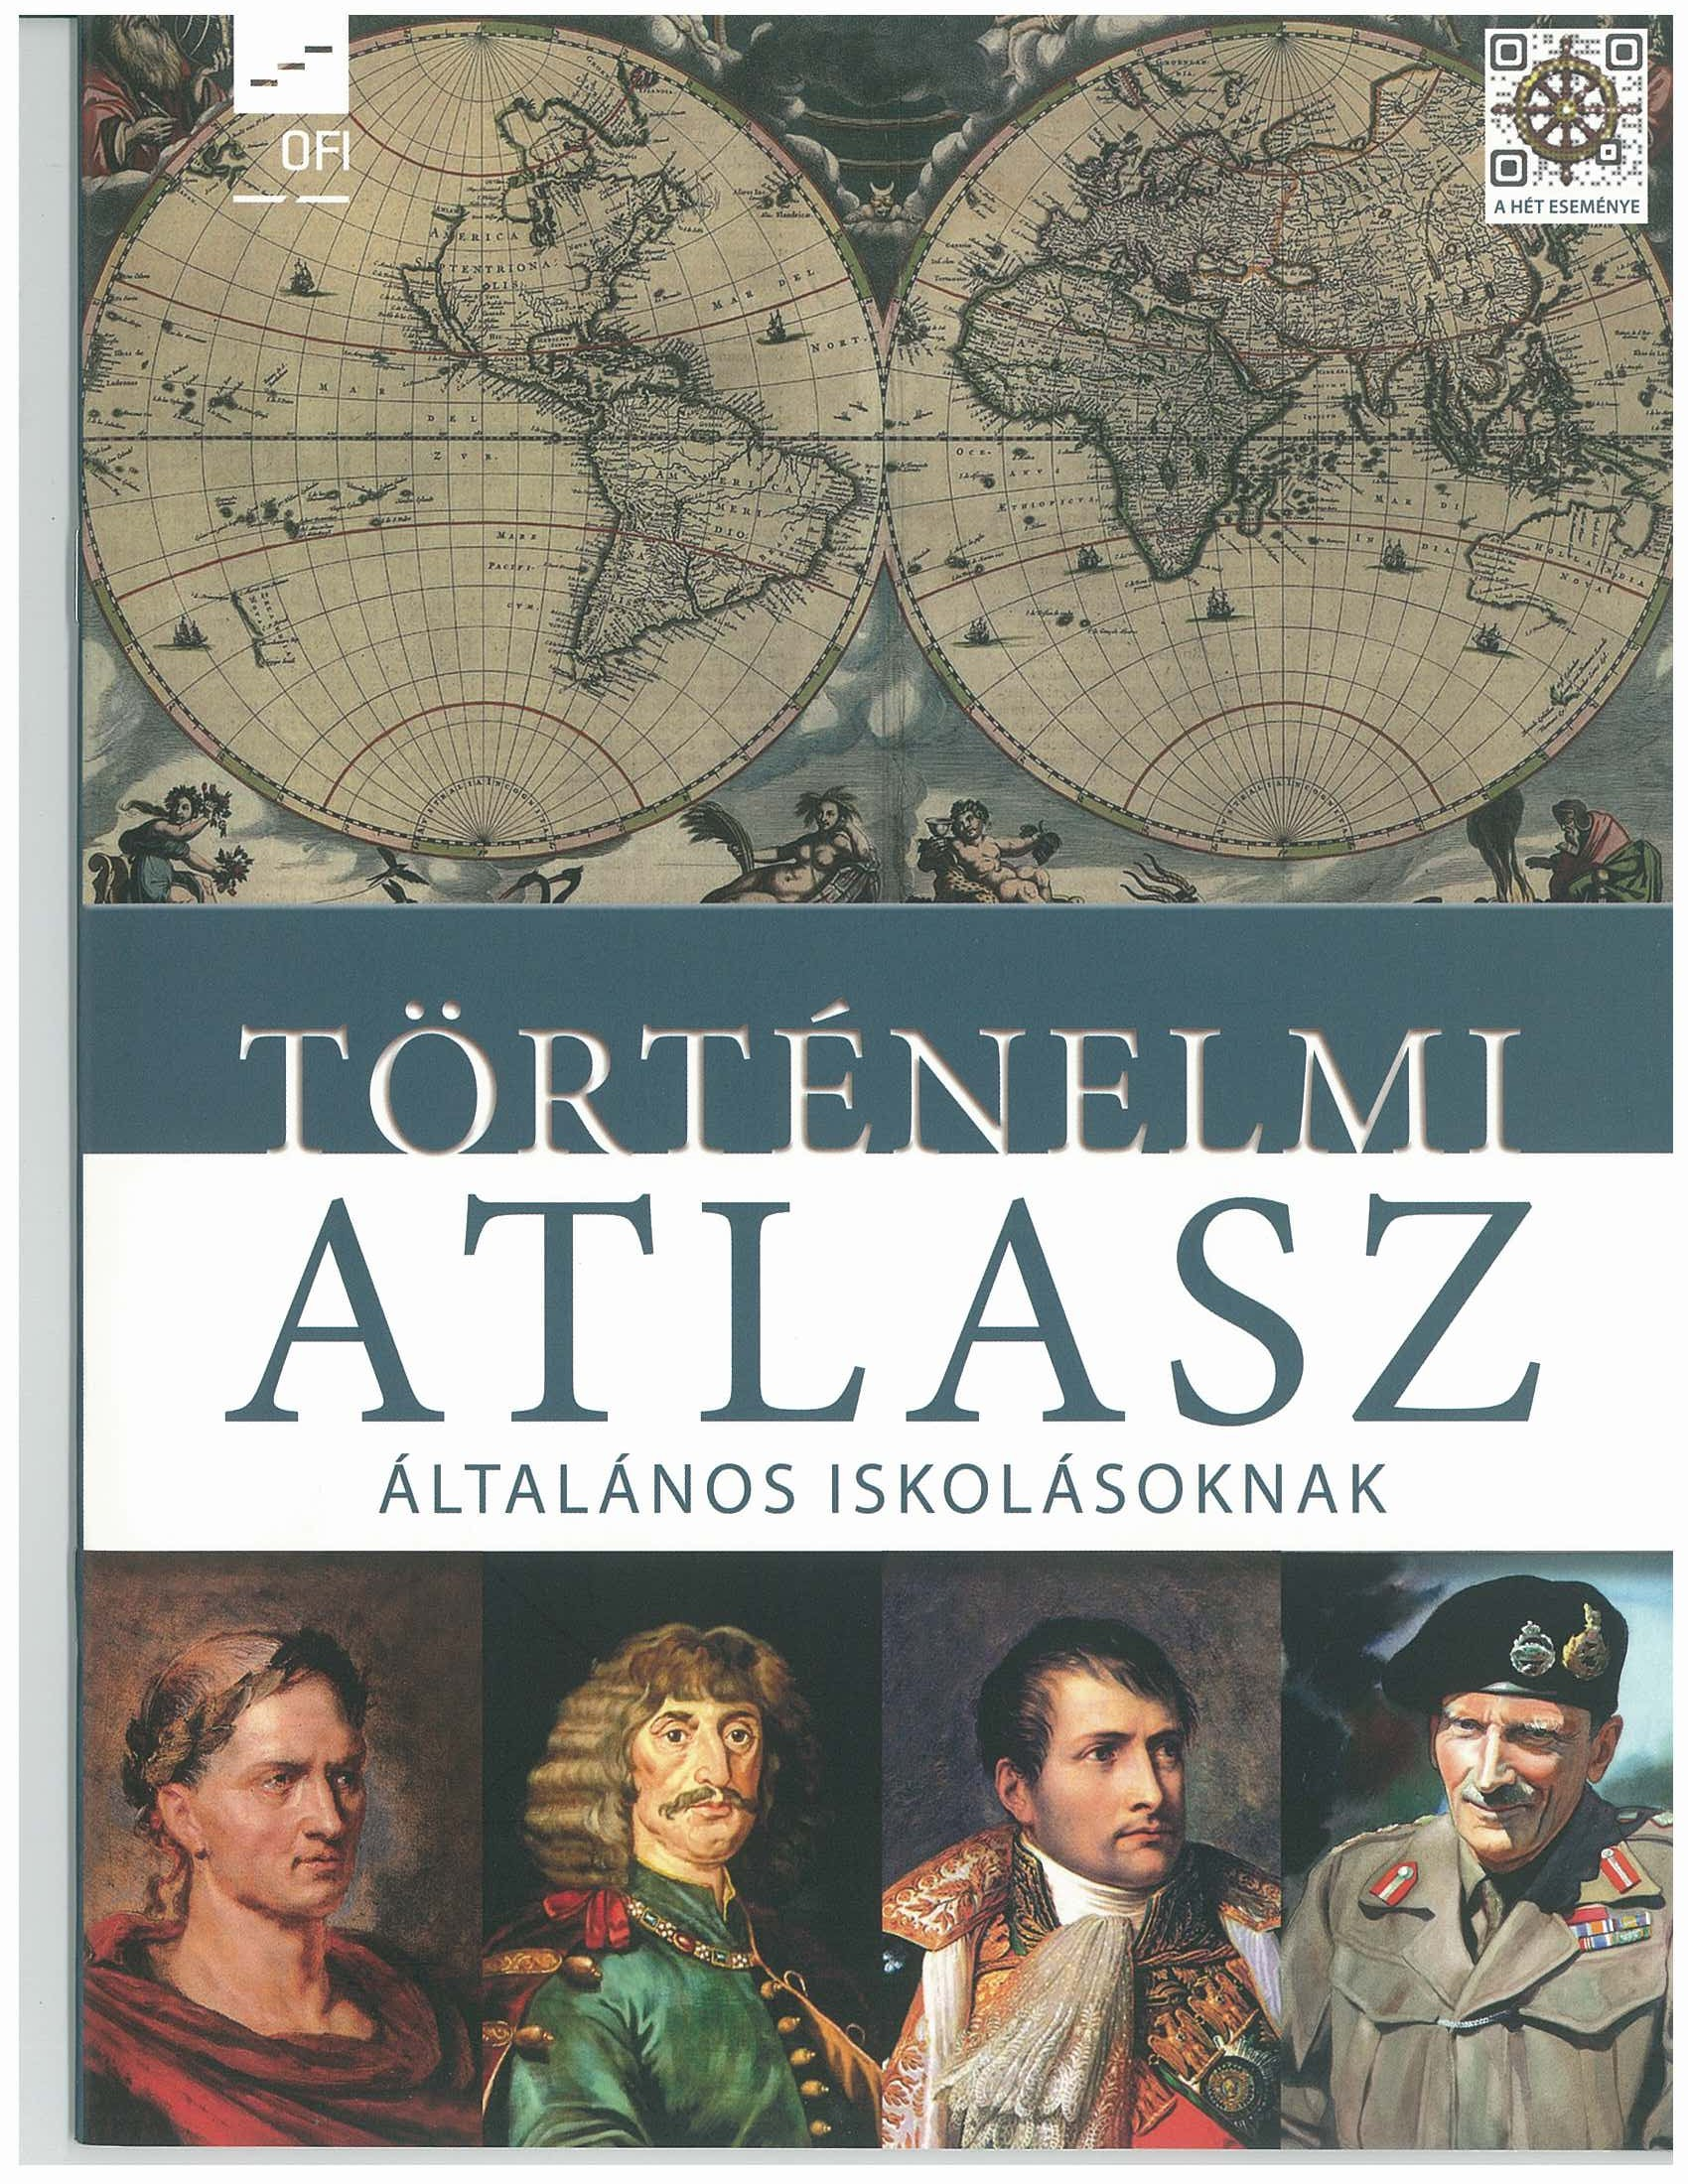 ofi_tortenelmi_atlasz.jpg